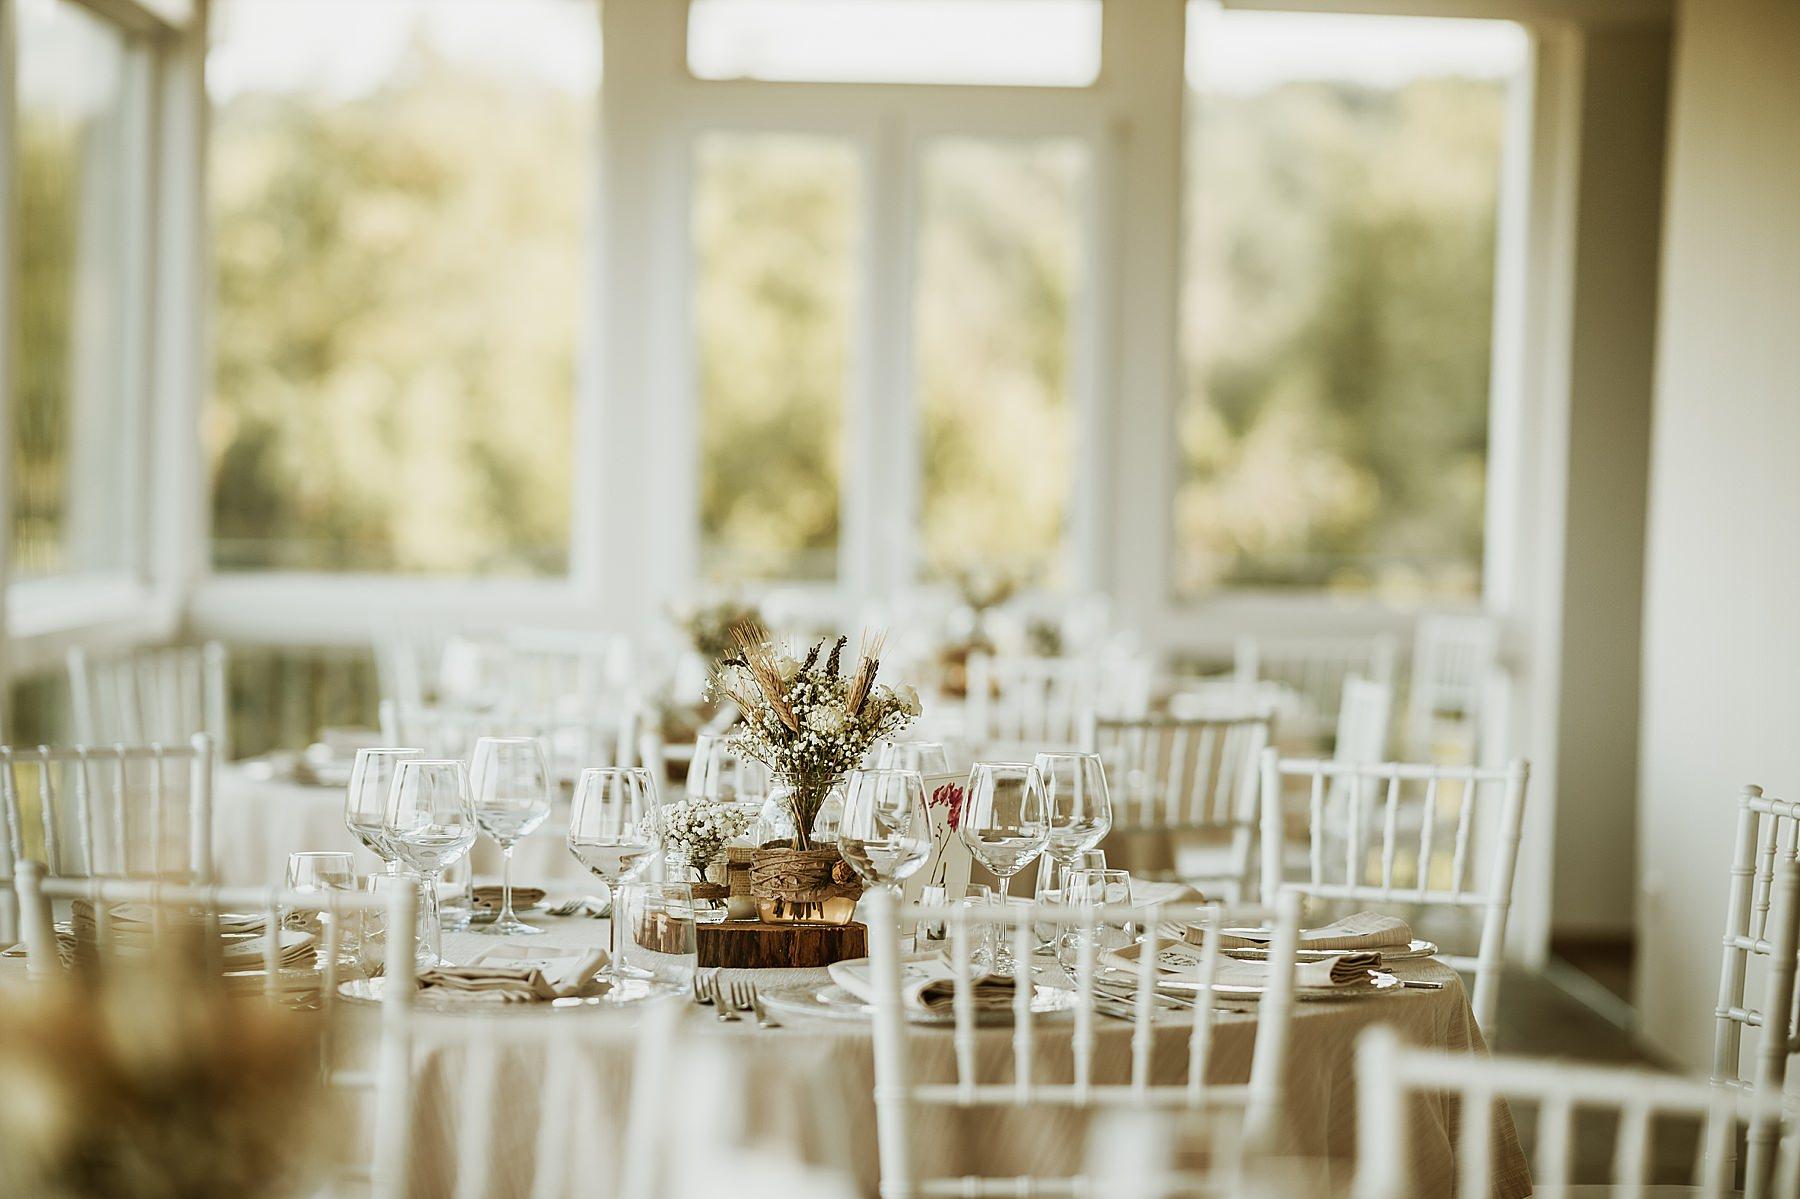 ricevimento matrimonio agriturismo relais campiglioni montevarchi